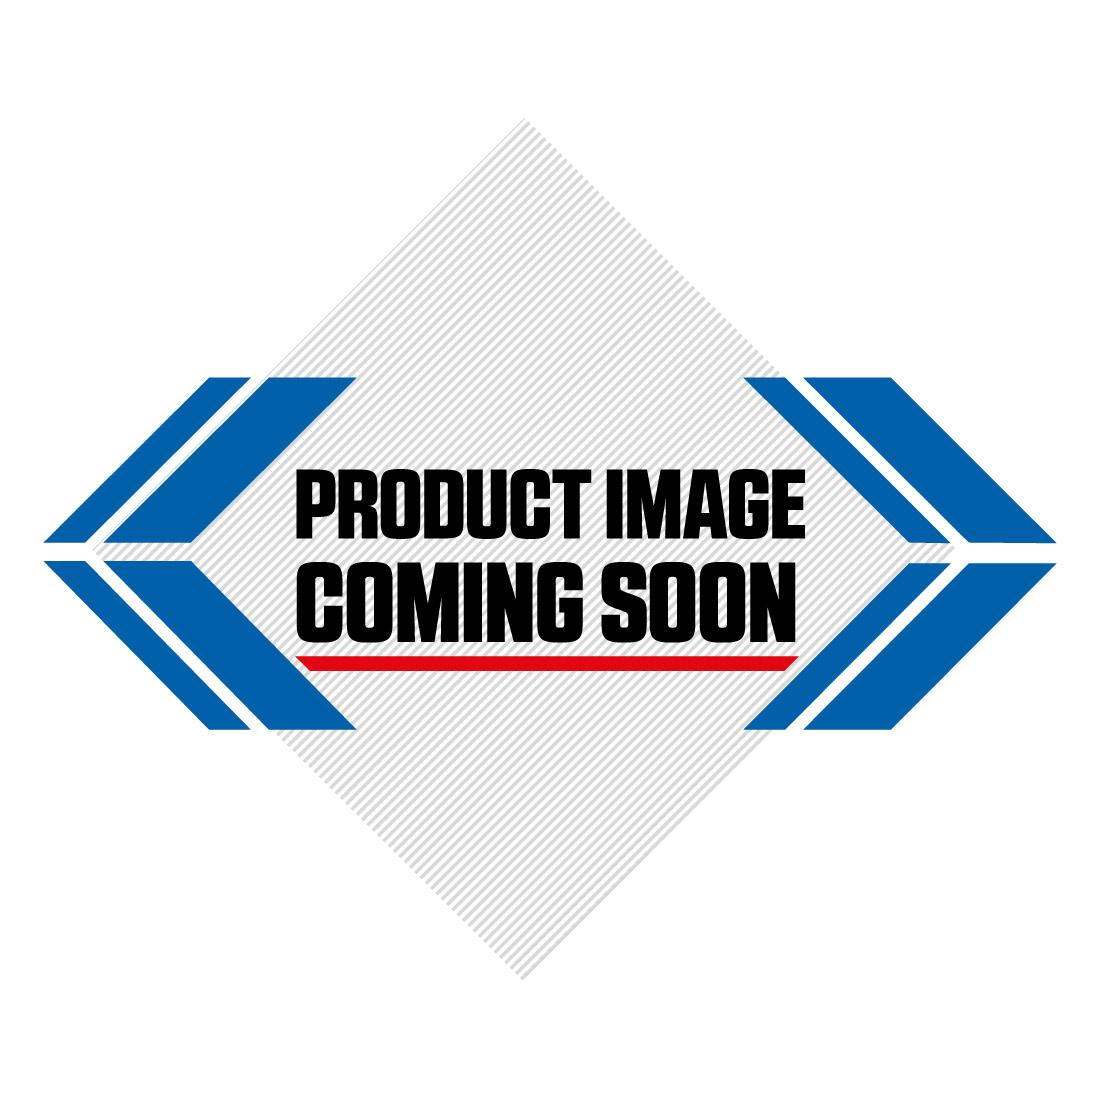 2019 UFO Interceptor 2 Helmet - Galaxy Limited Edition Image-4